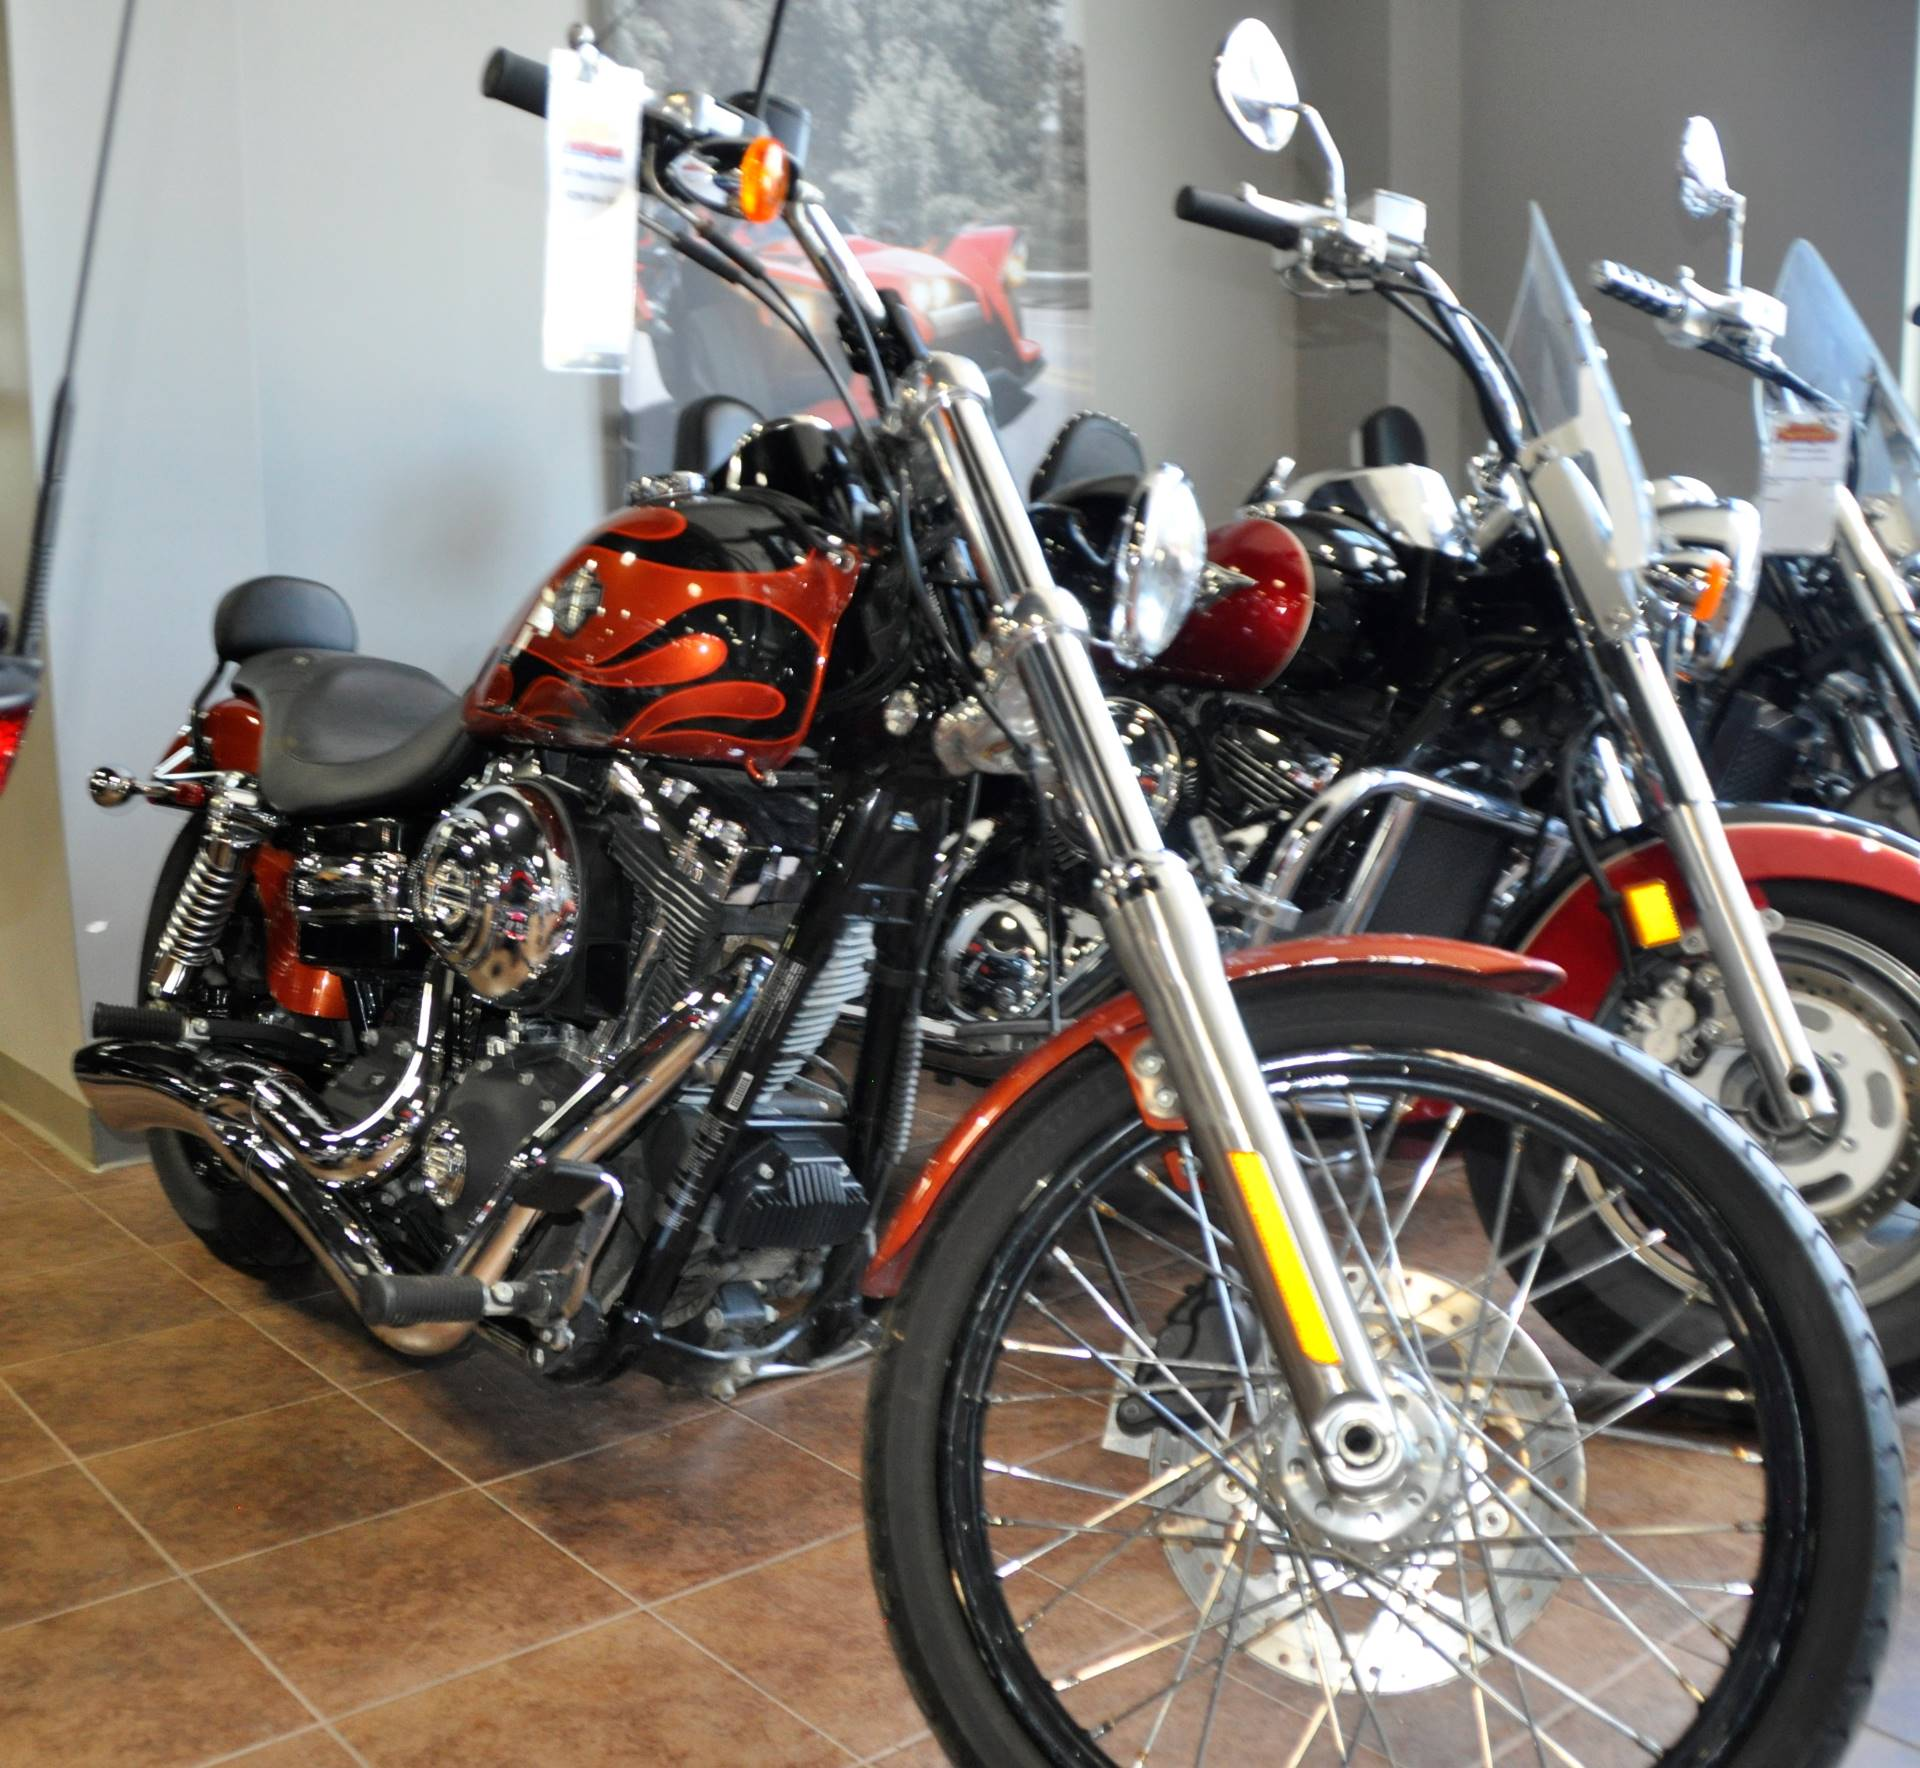 2011 Harley-Davidson Dyna Wide Glide 1